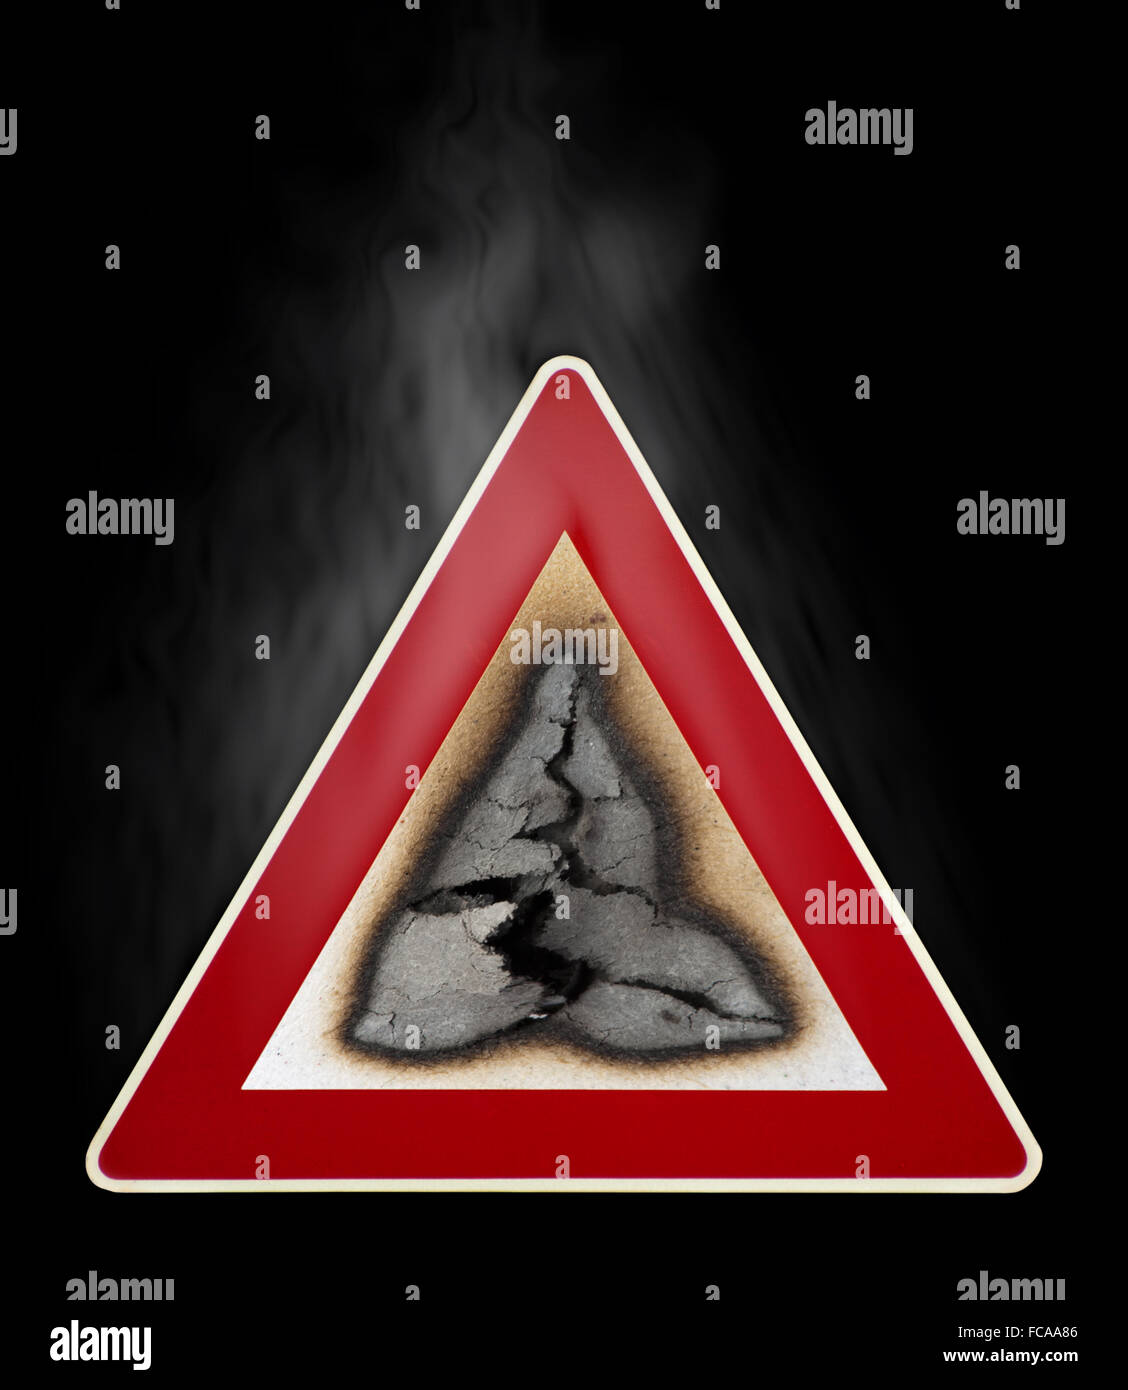 Warning Sign Fire Hazard Stock Photo 93655302 Alamy